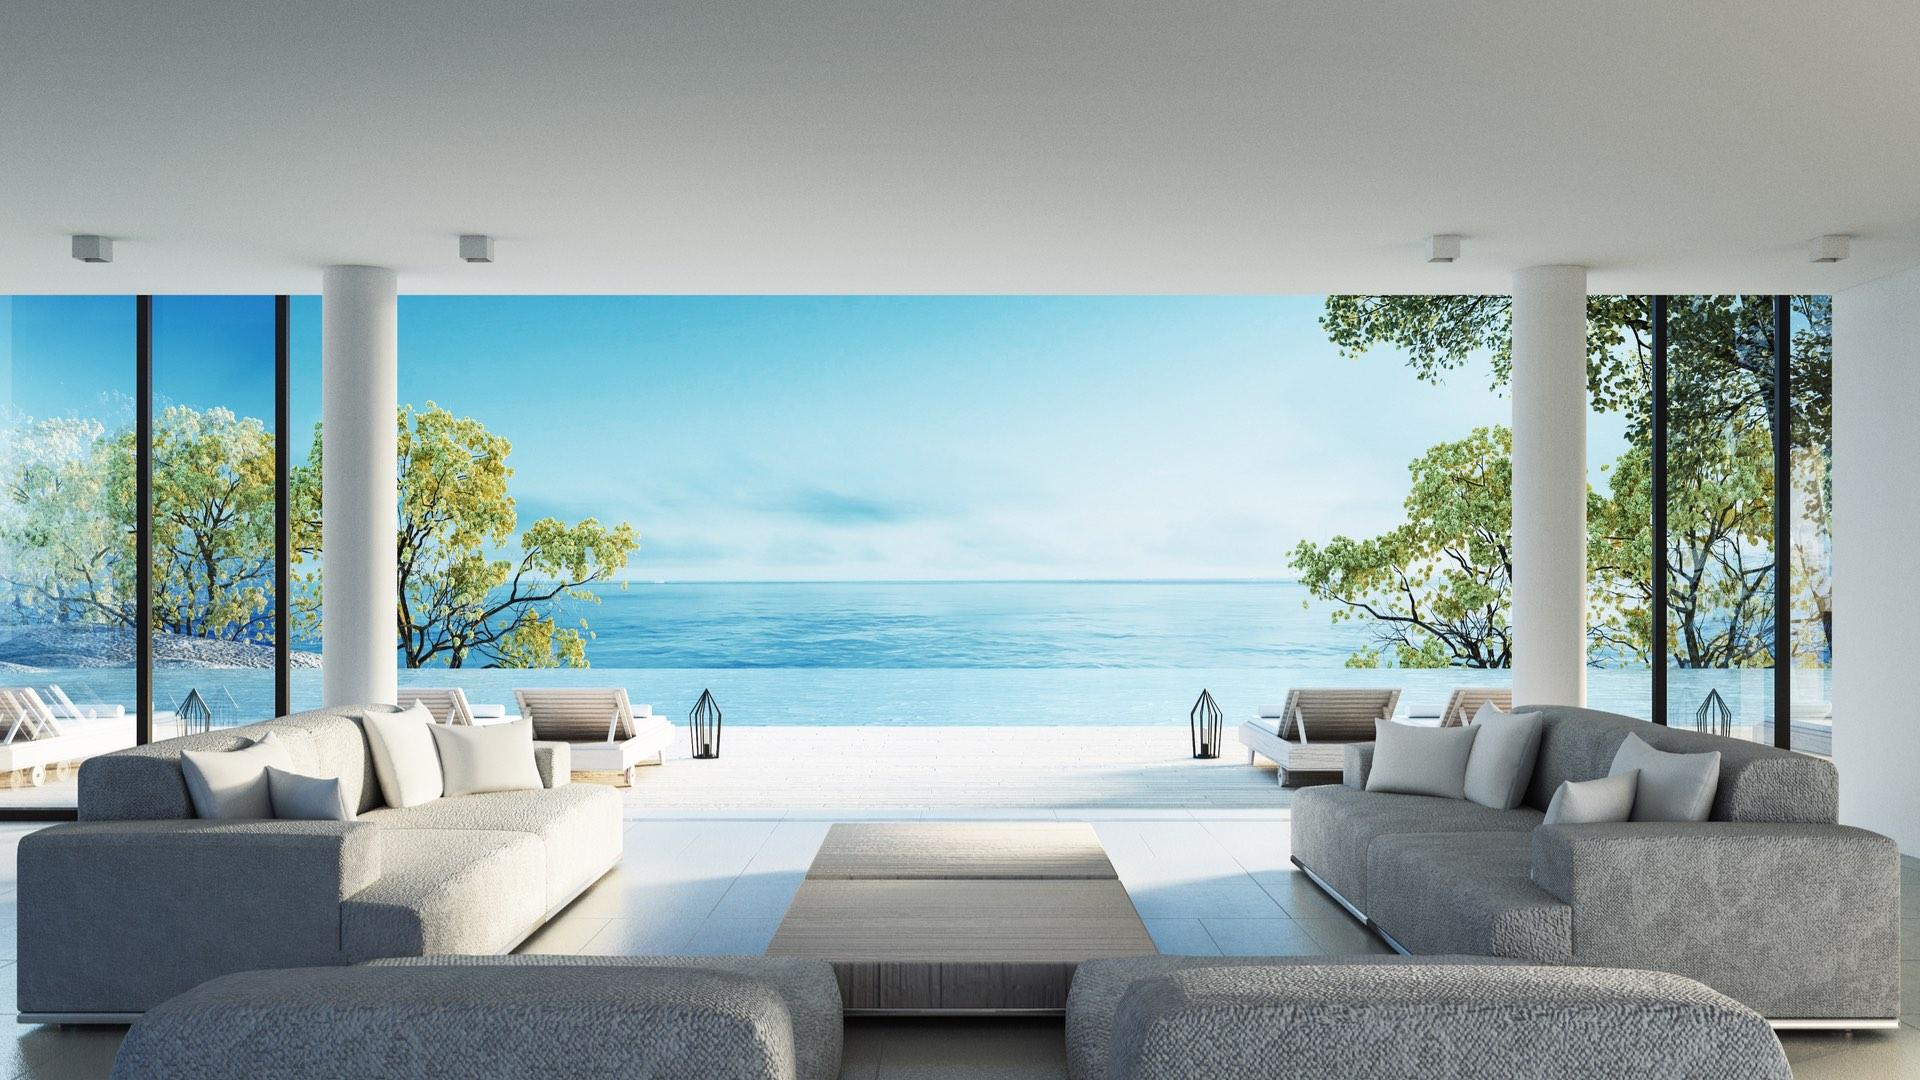 Strandhaus mit Meerblick | ©Ton Tectonix/Shutterstock.com